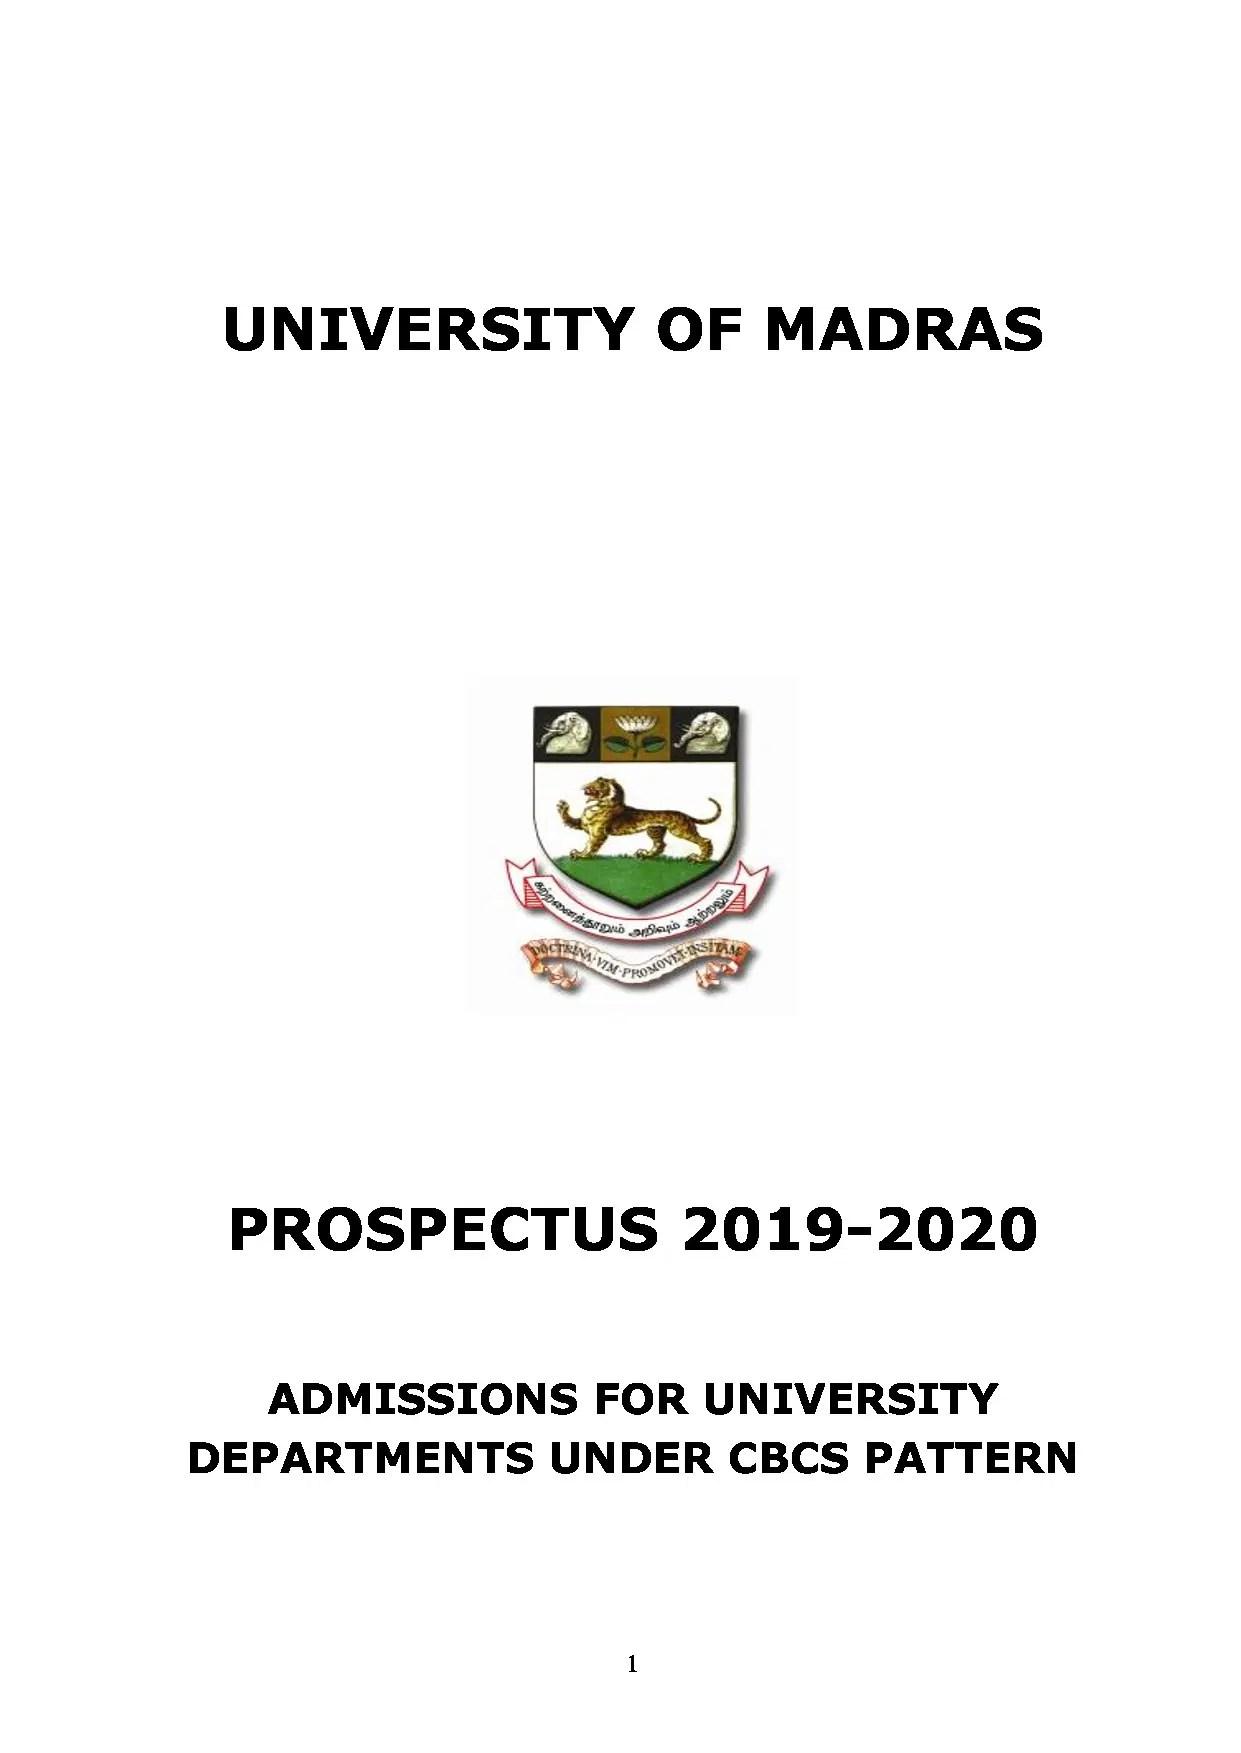 Madras University [University of Madras], Chennai